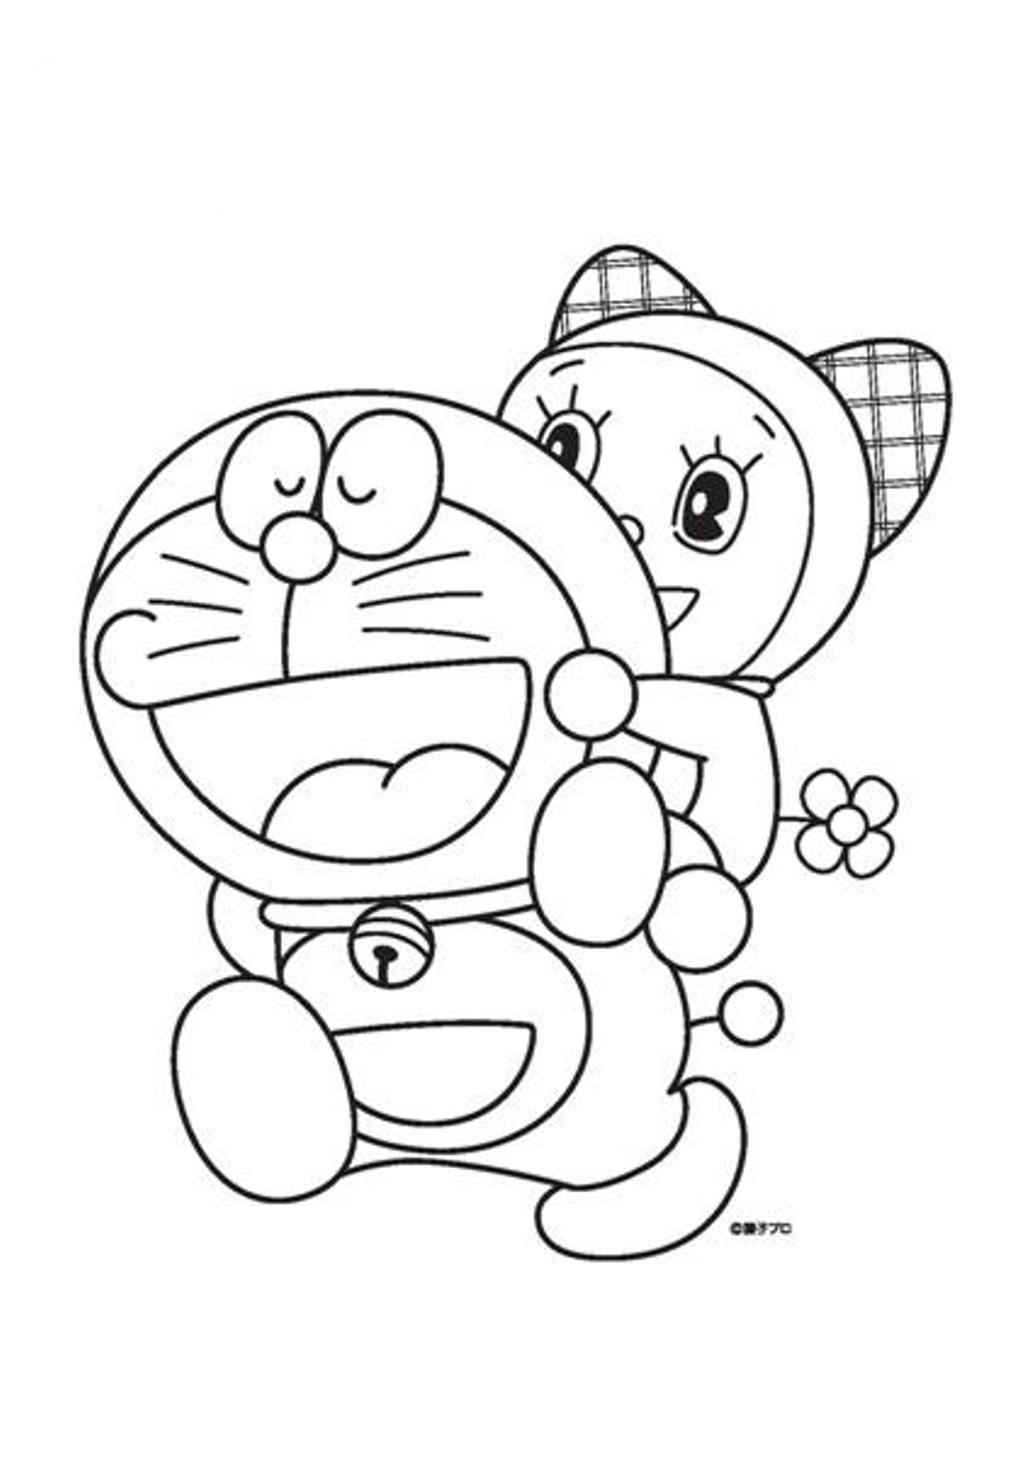 10 Mewarnai Gambar Doraemon